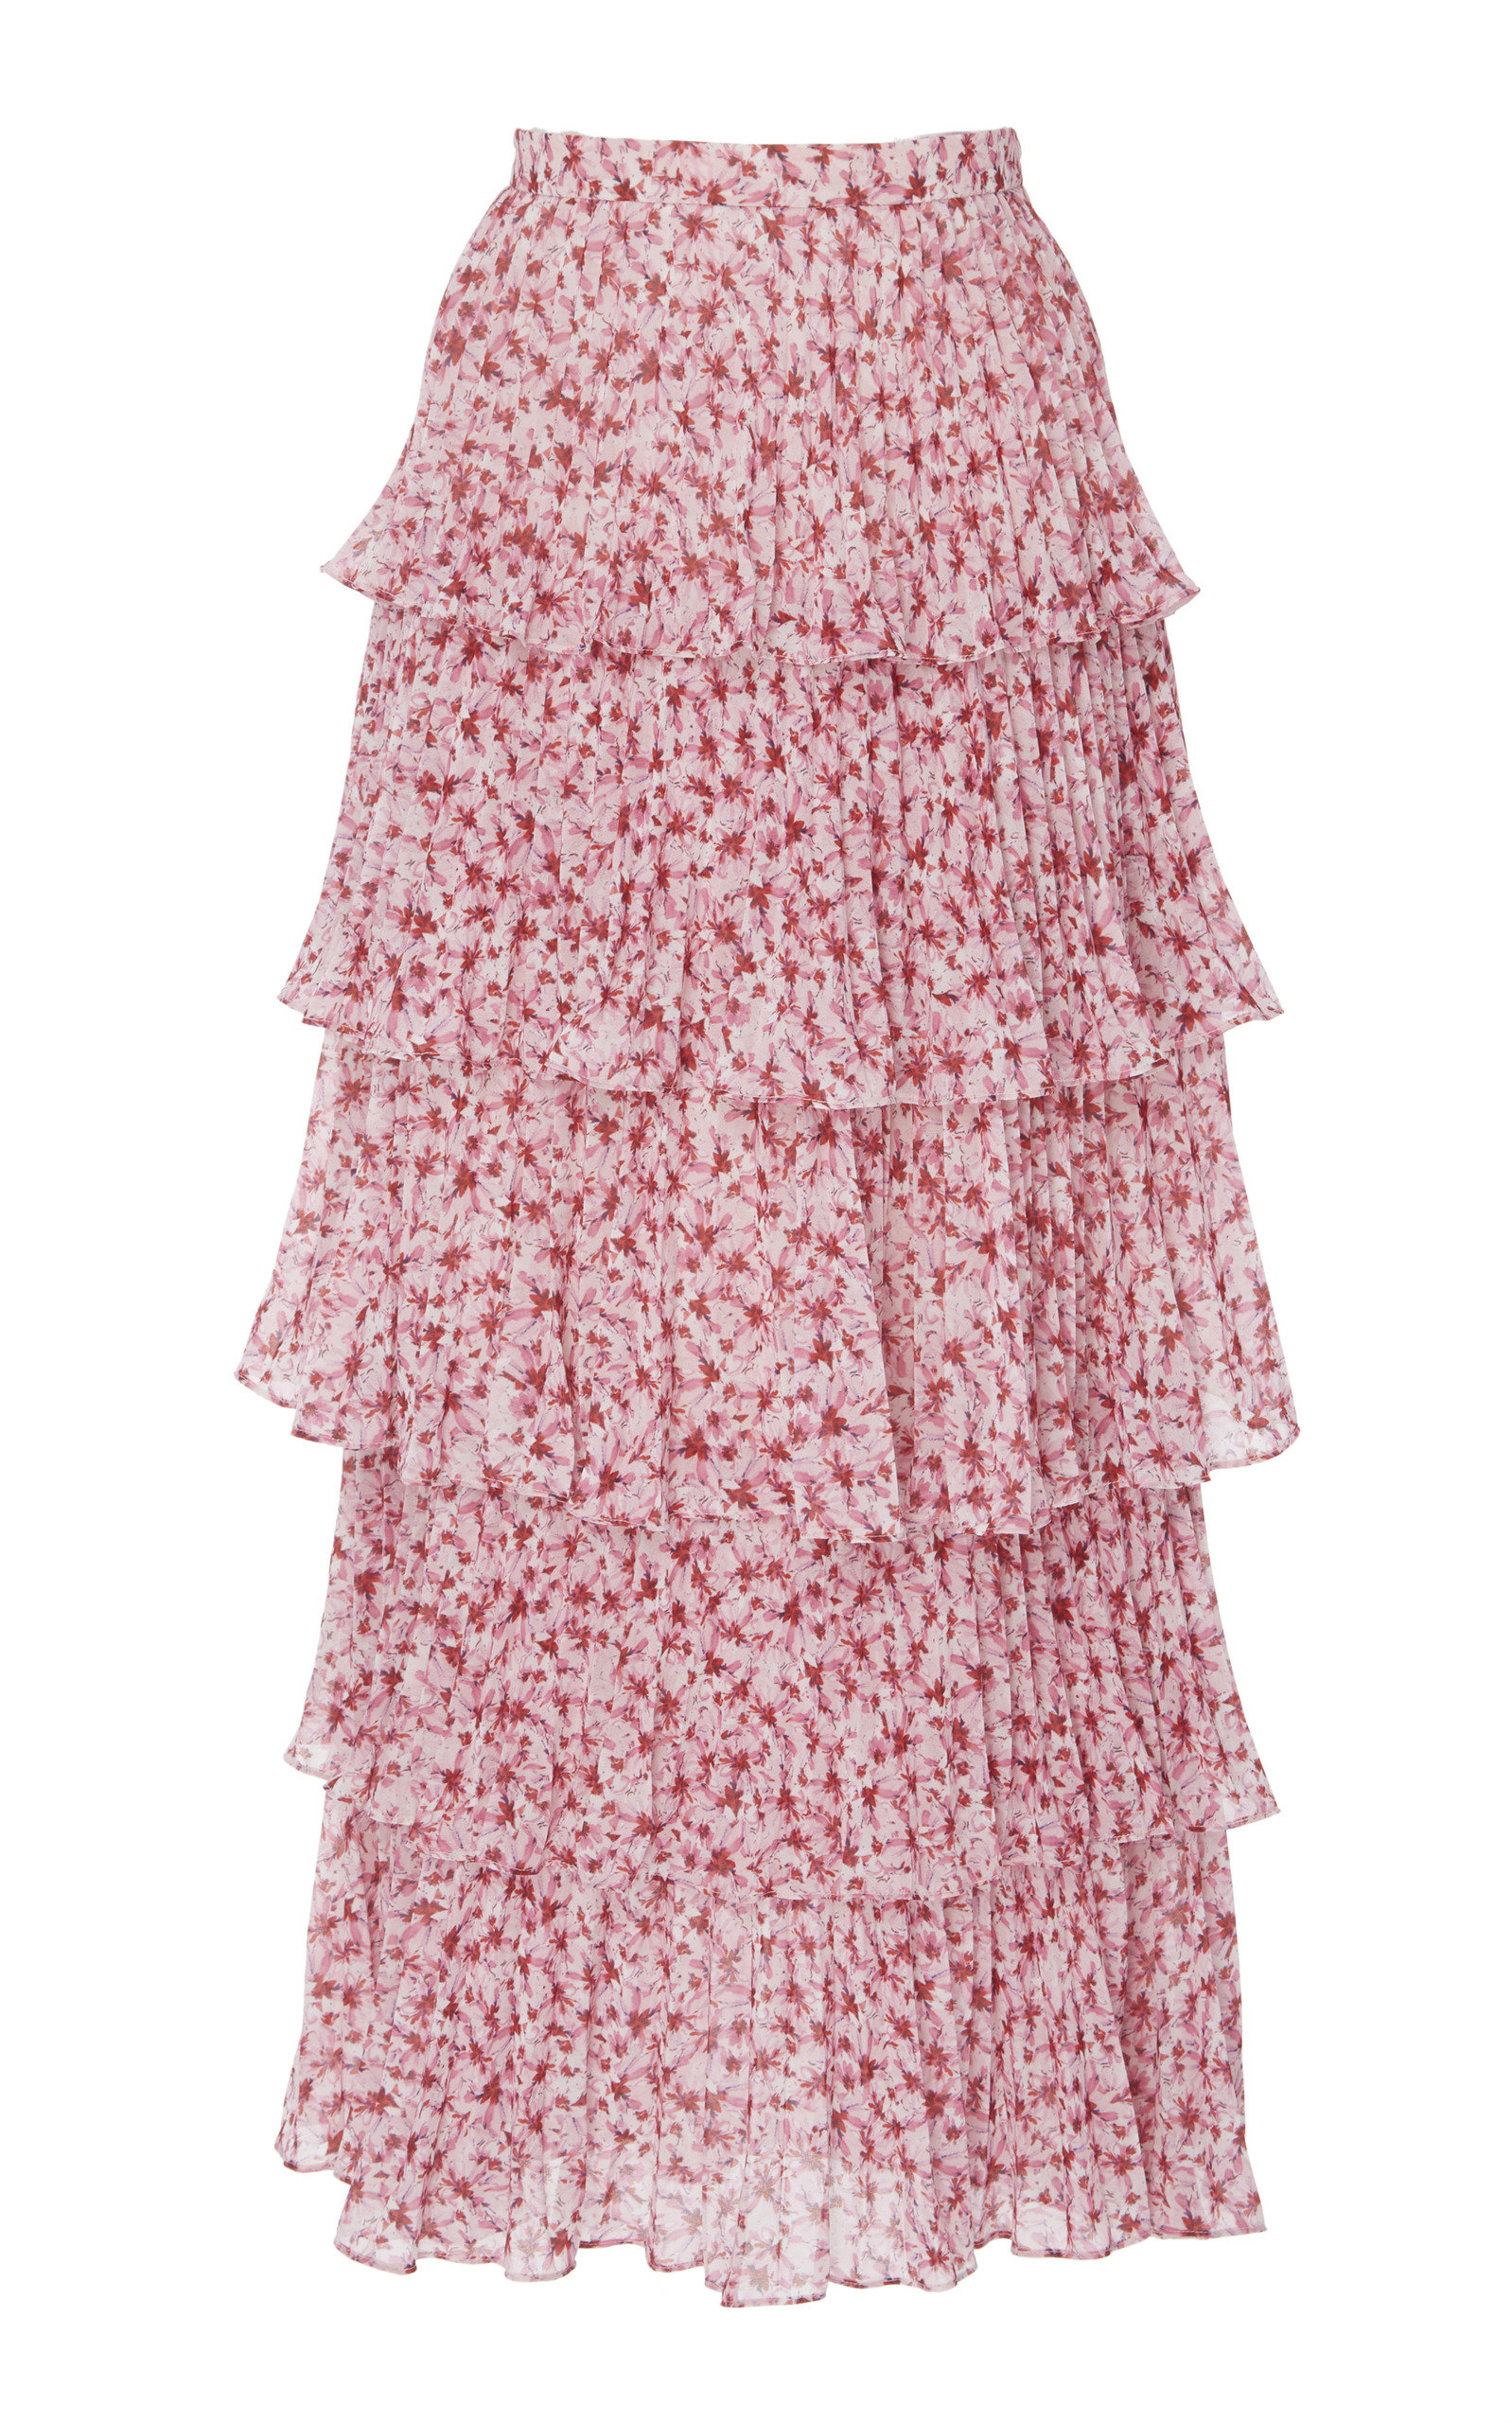 AMUR Floral-Printed Chiffon Midi Skirt